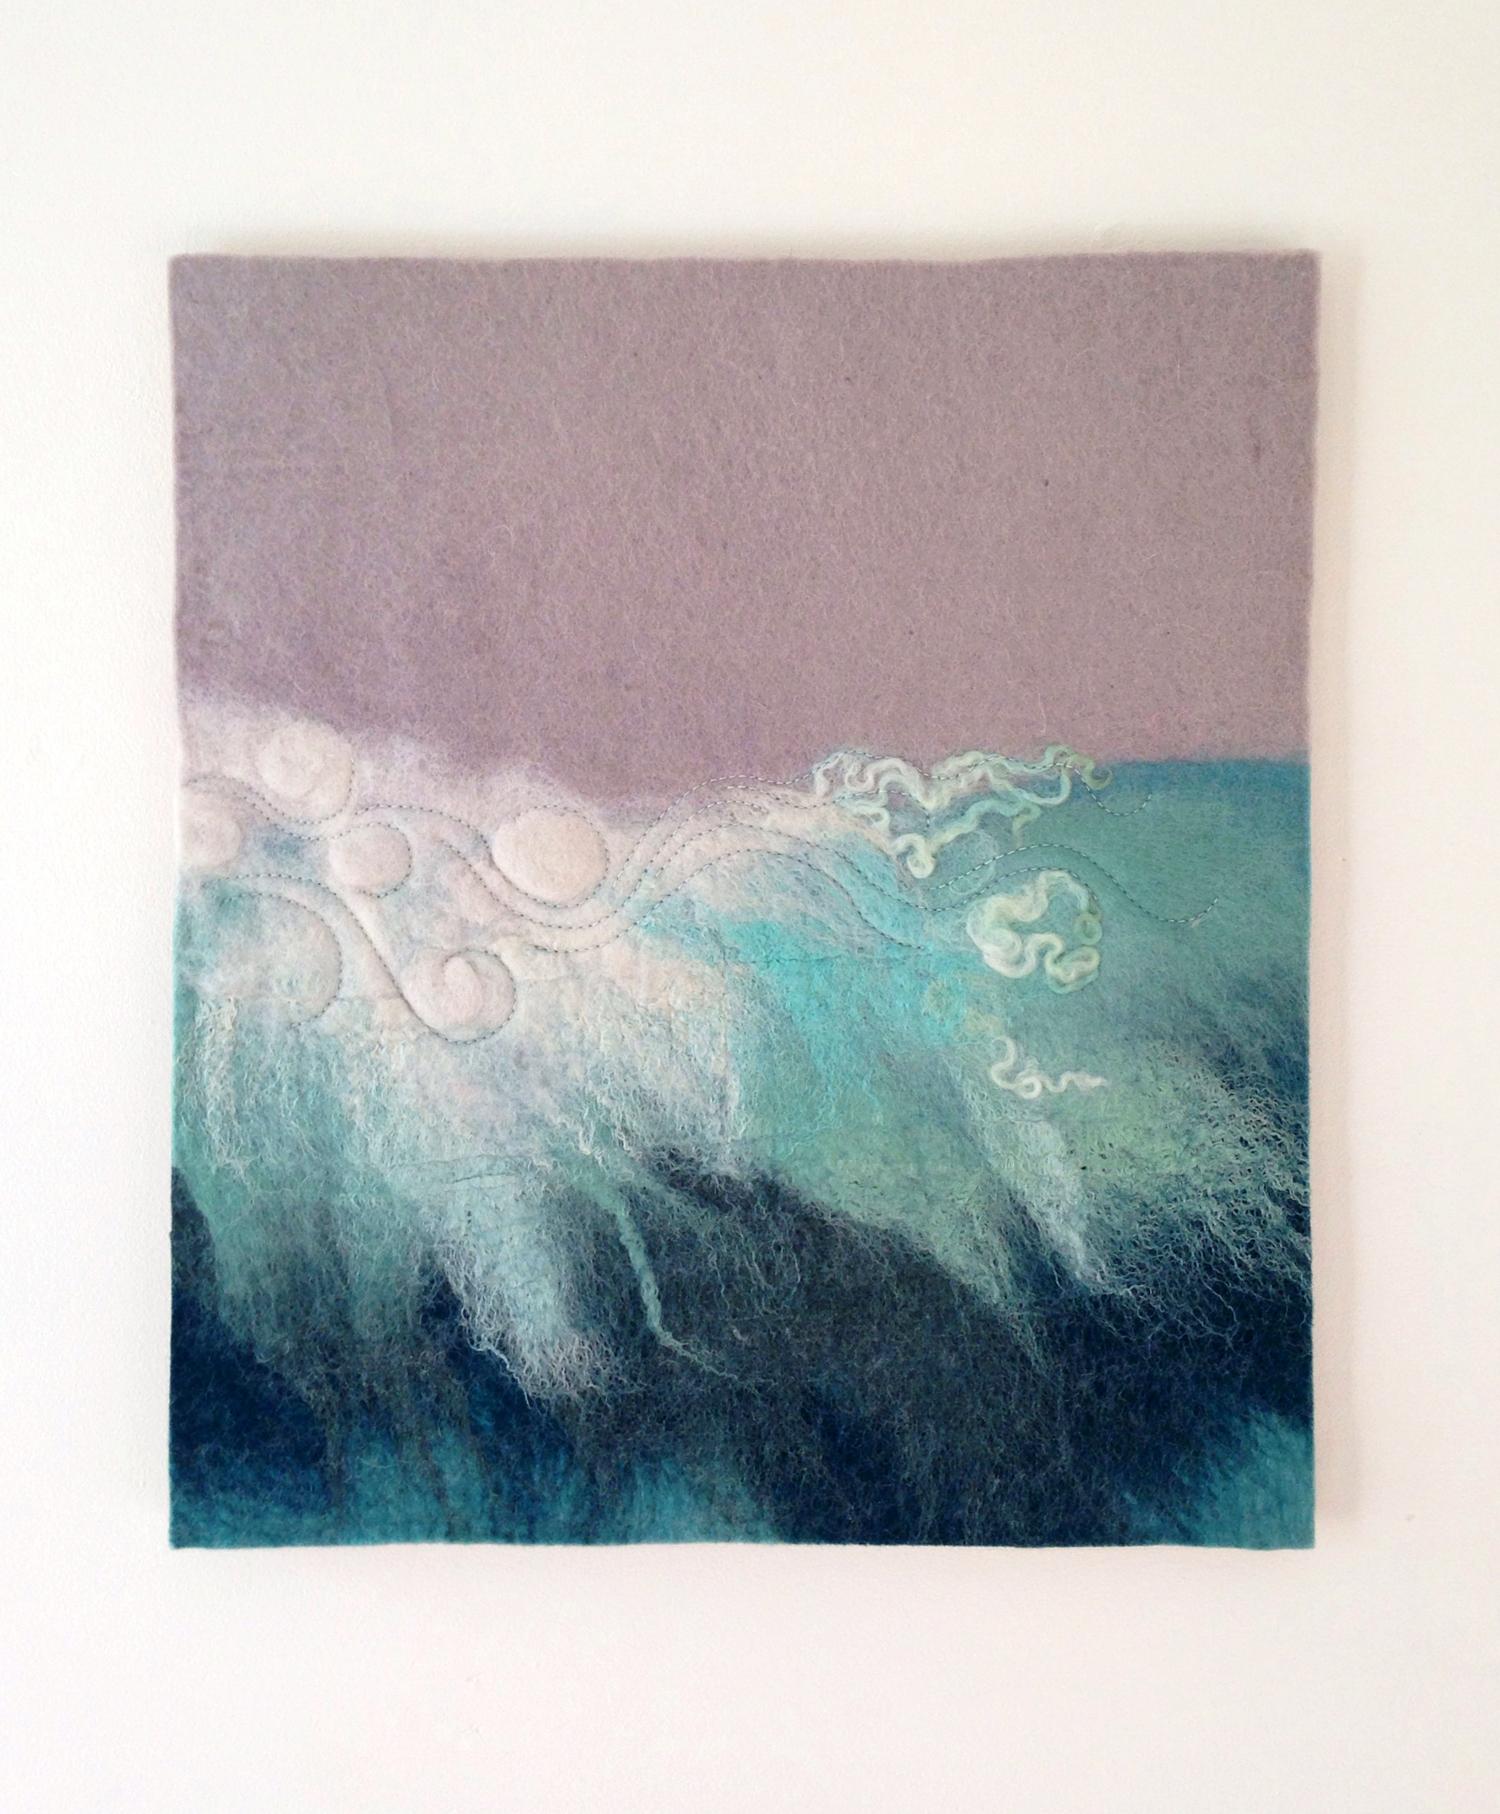 """Surf Break""  (photo 2 of 2)"